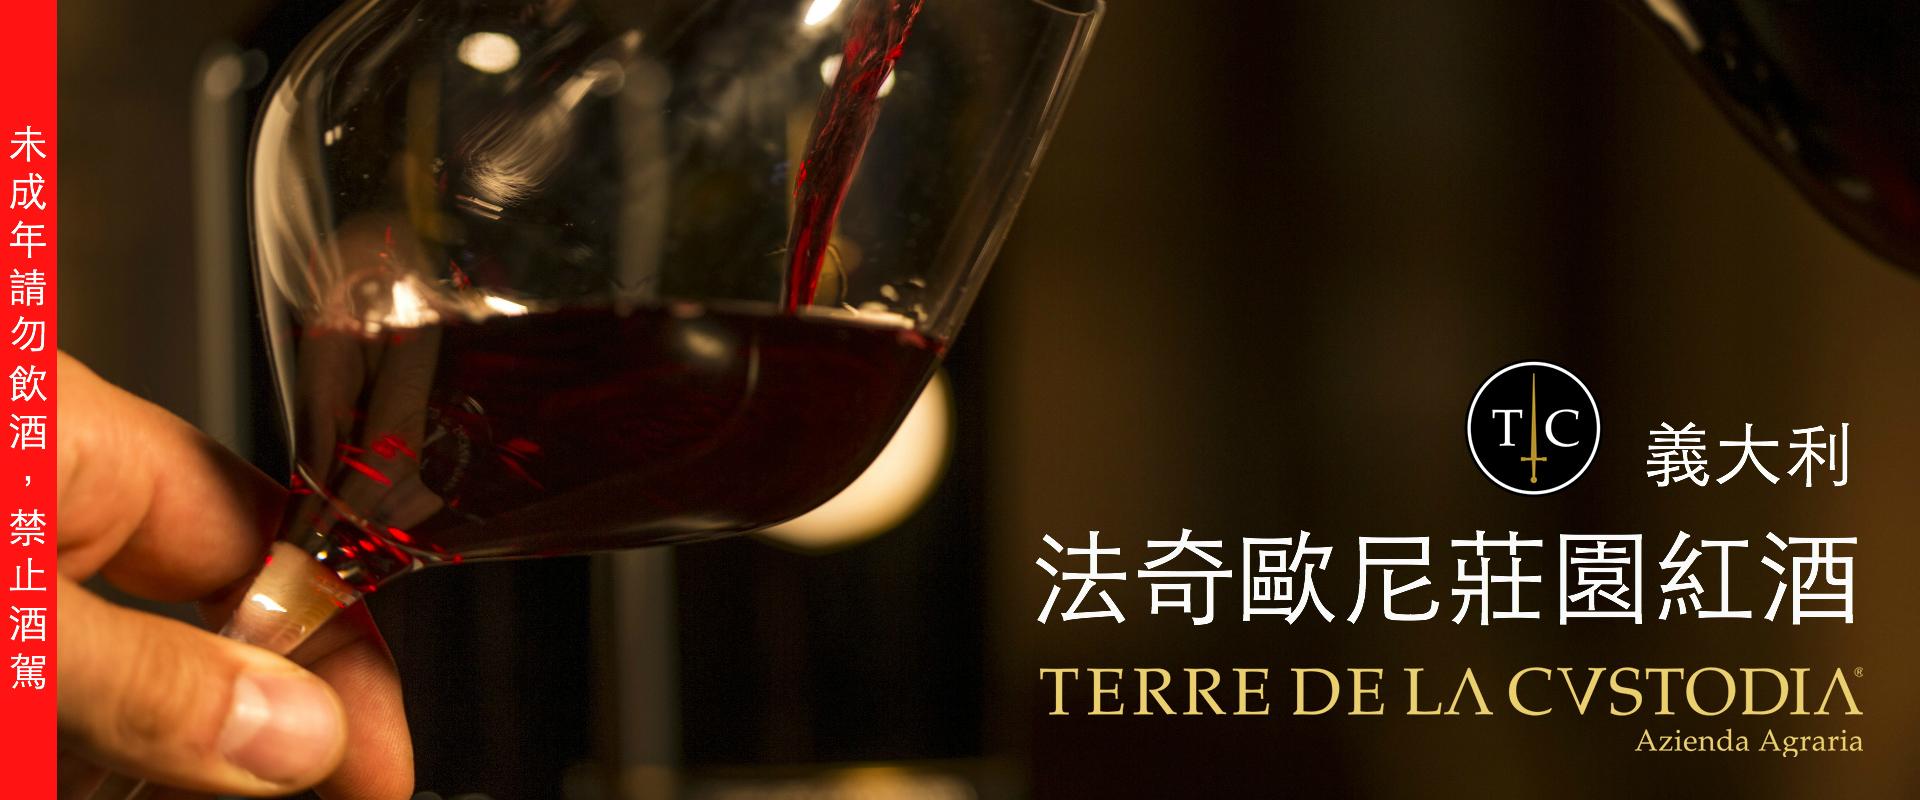 法奇歐尼莊園紅酒farchioni umbria wine